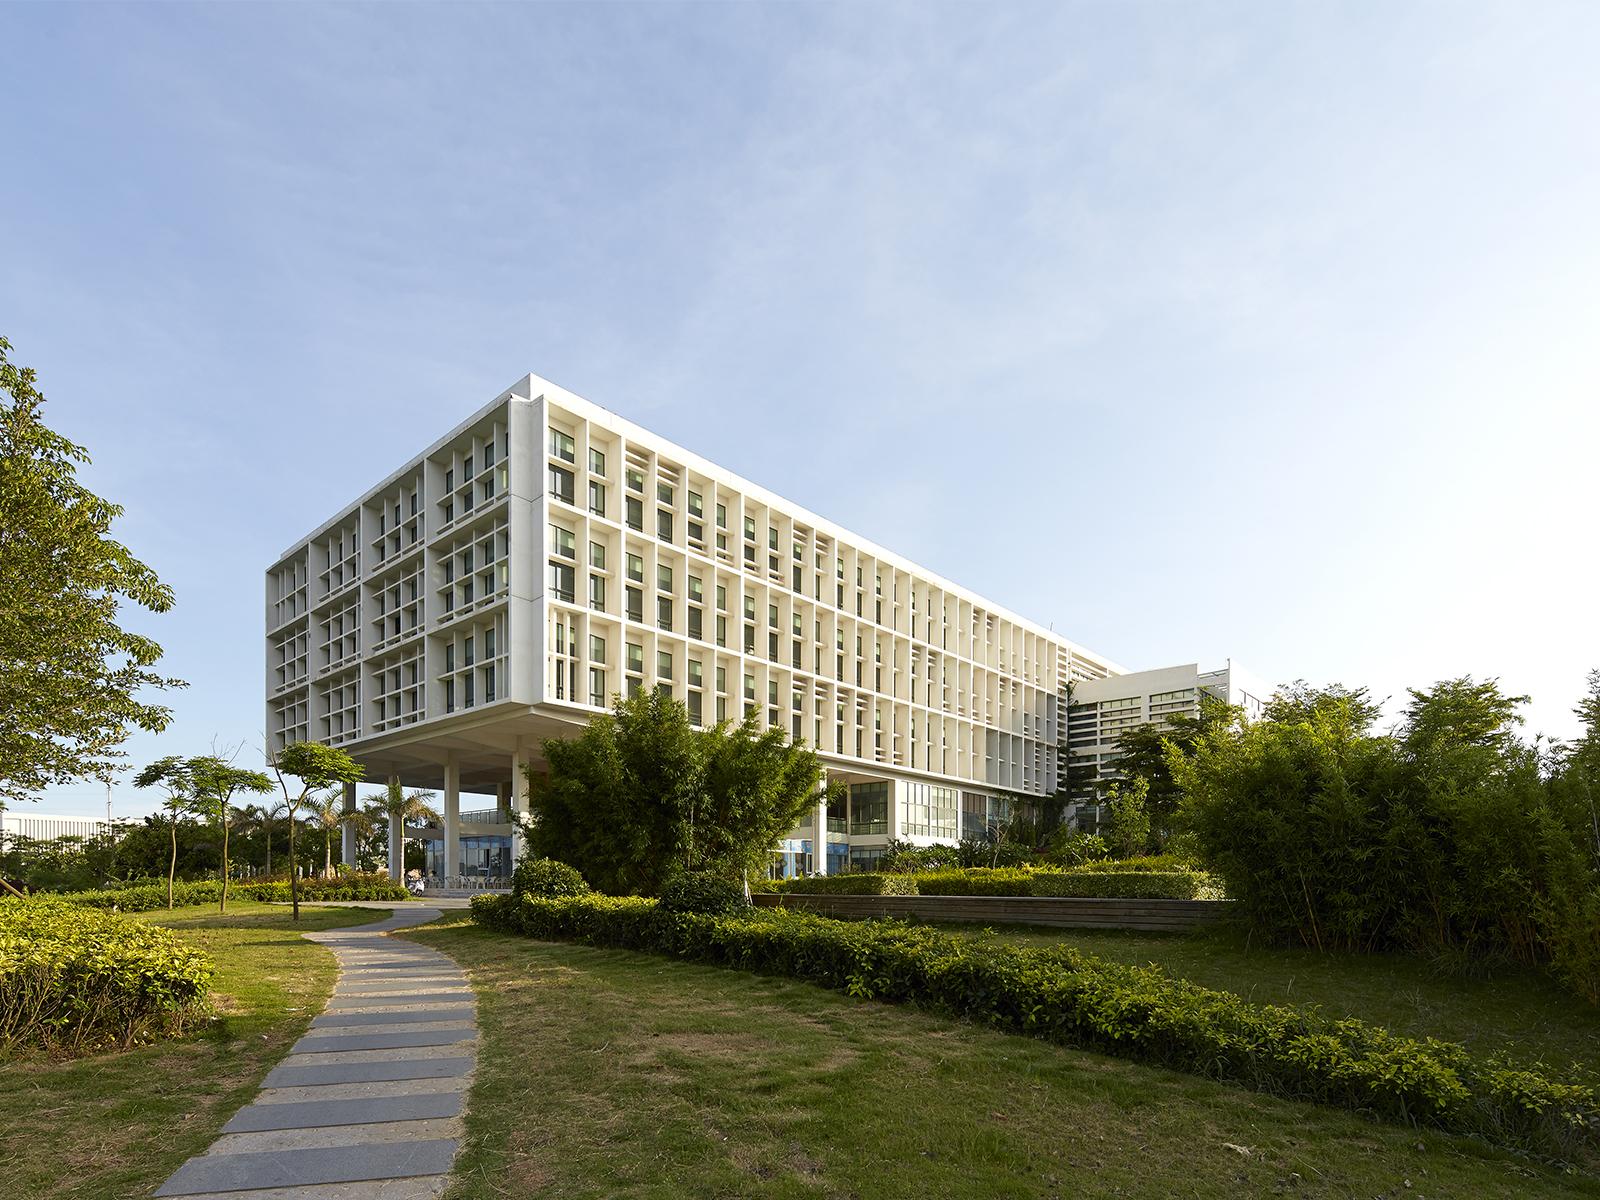 厦门南洋学院_Xiamen Nanyang College_Right_05.jpg